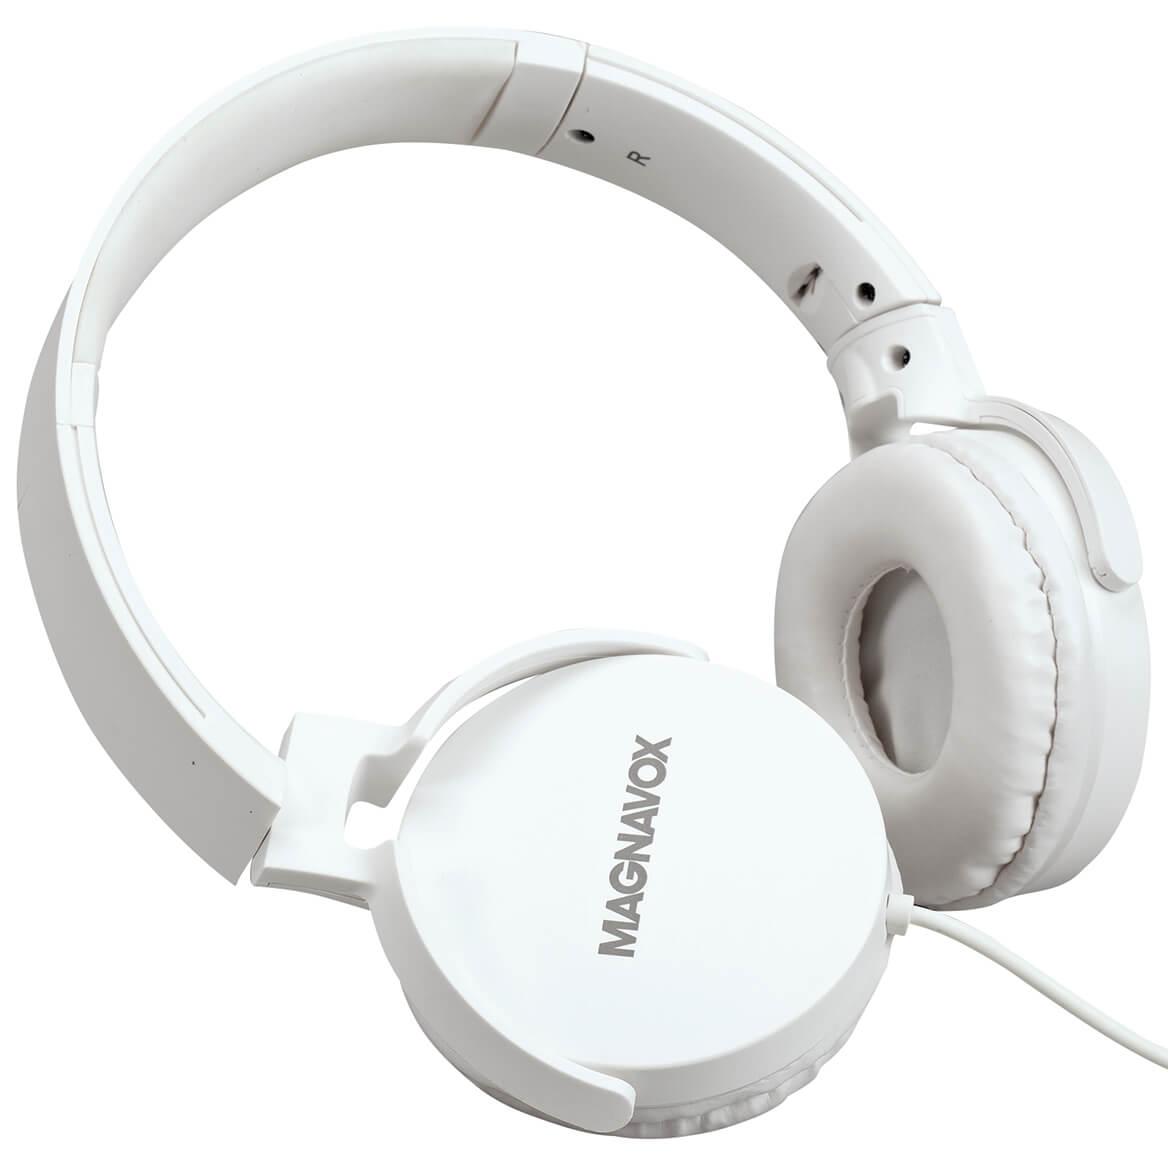 Magnavox™ Foldable Stereo Headphones-371324